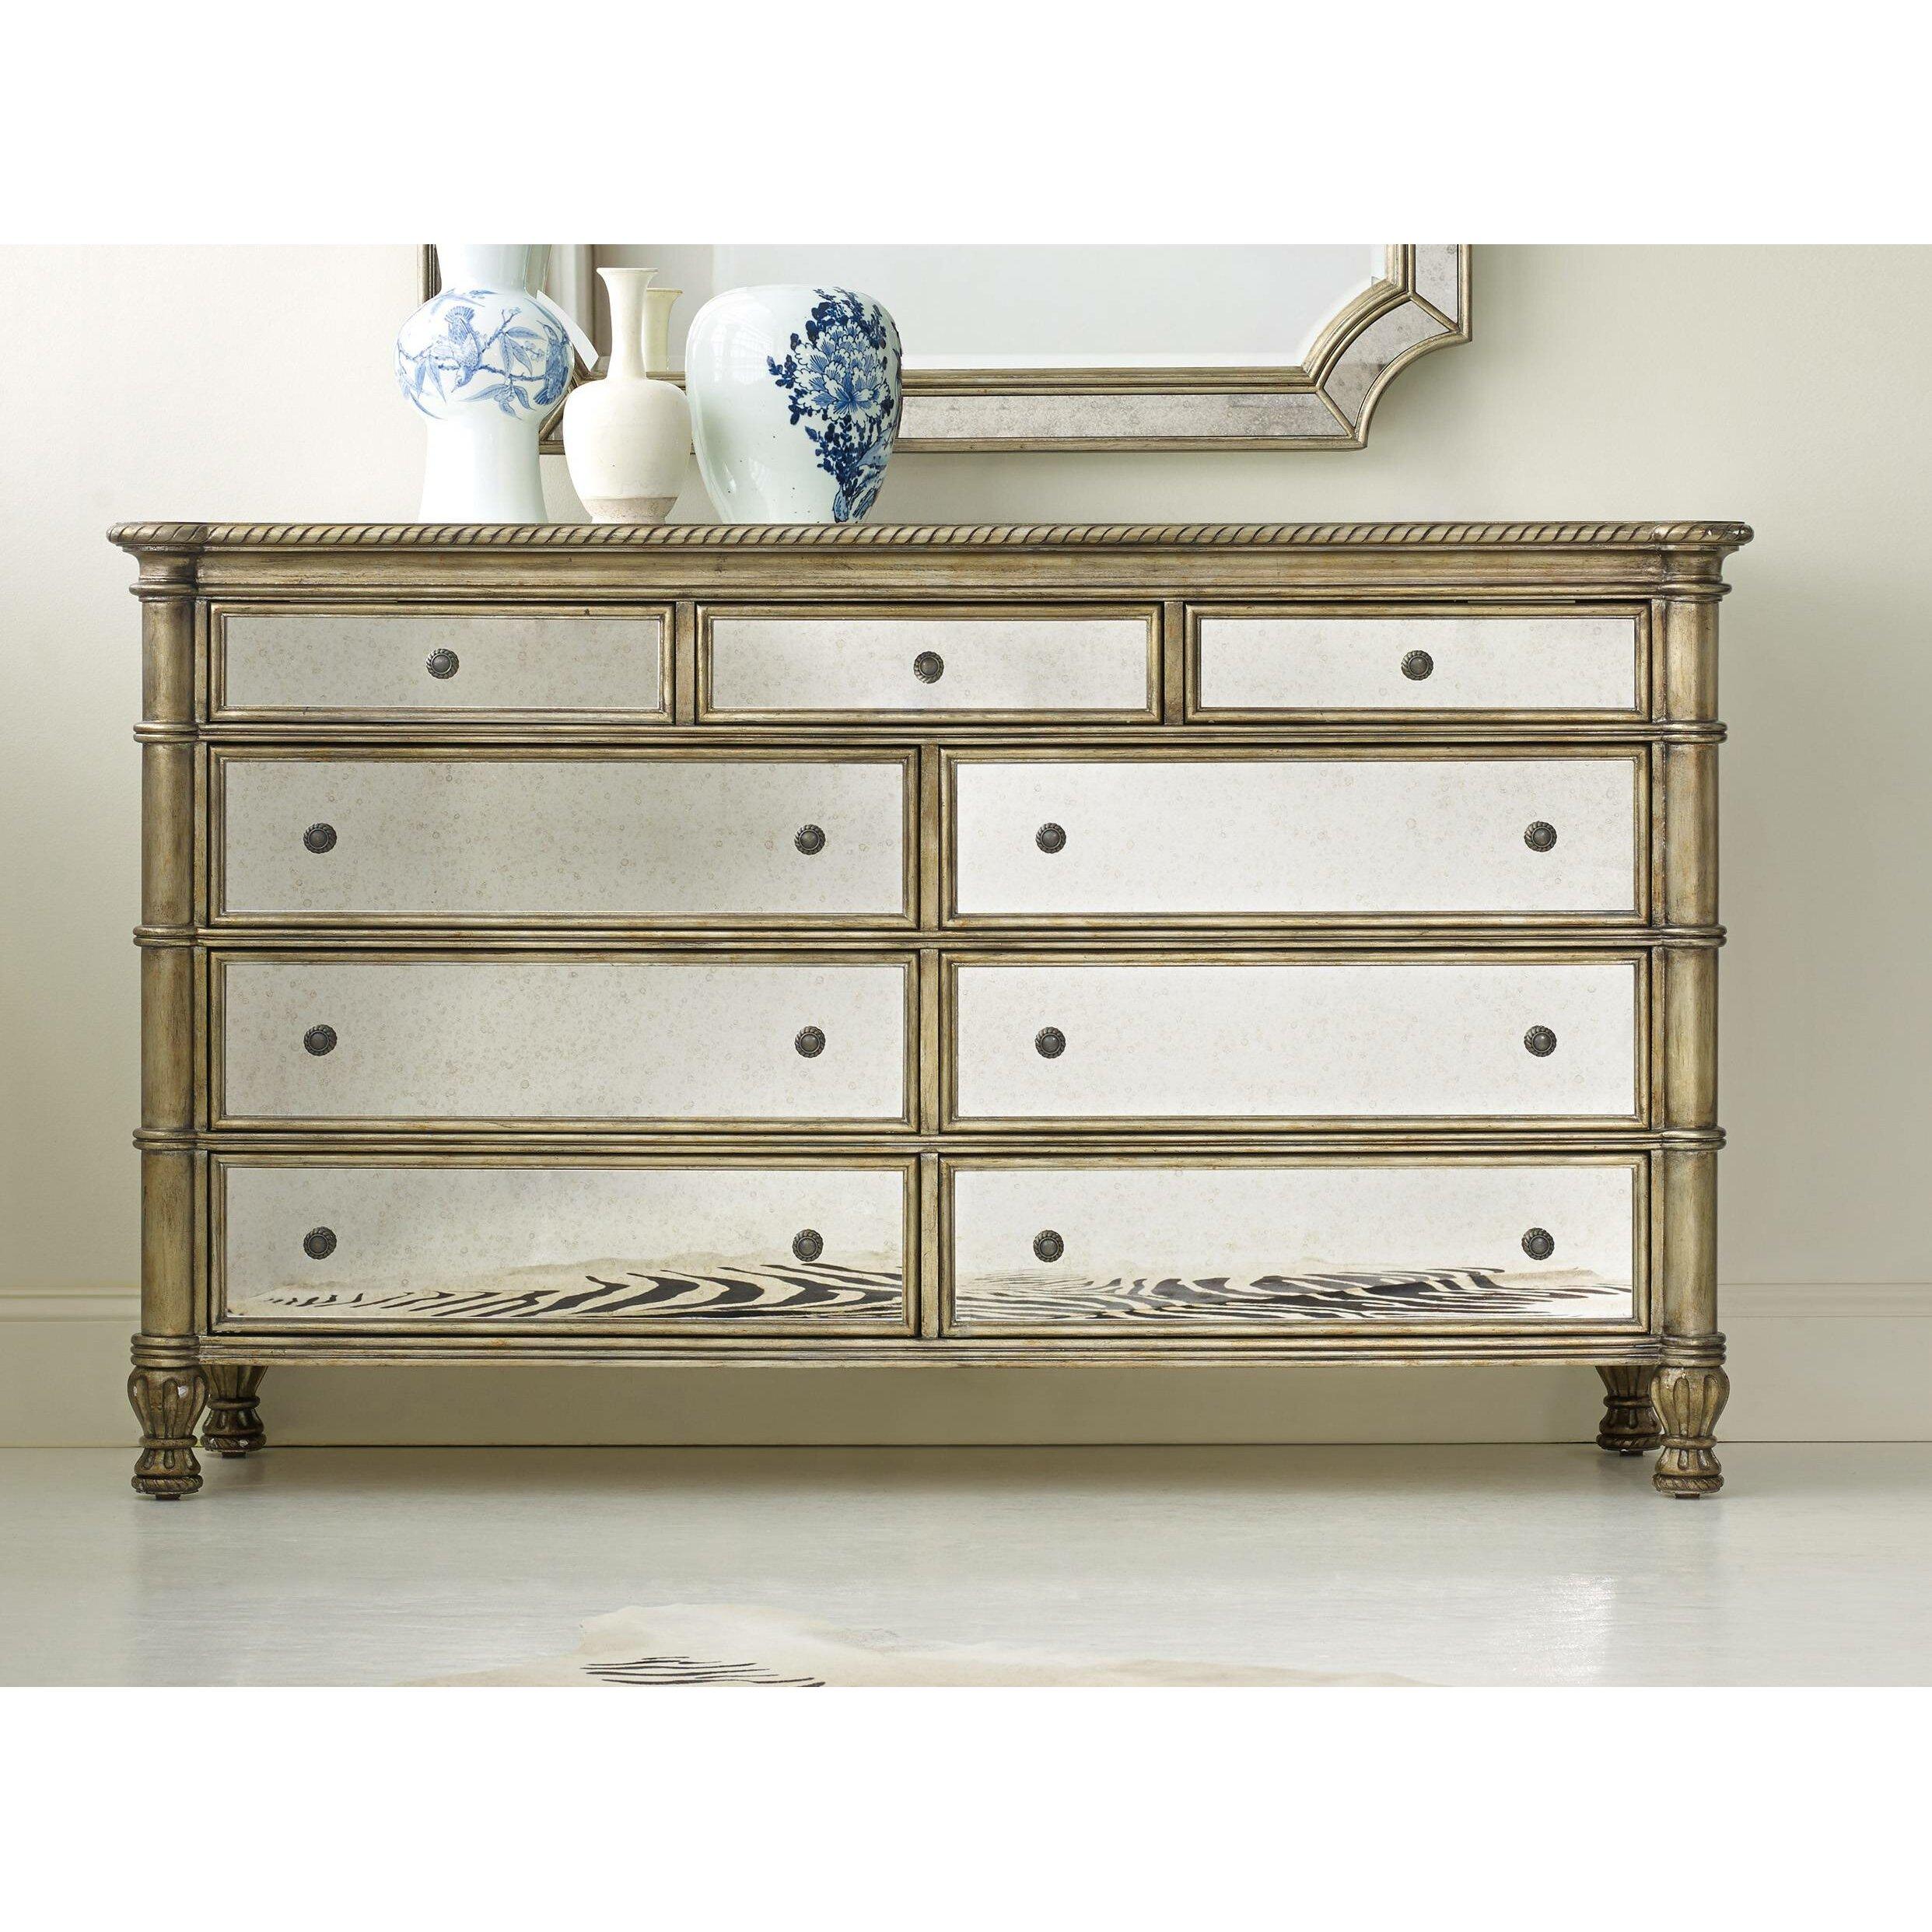 Hooker Furniture Melange Canopy Customizable Bedroom Set Reviews Wayfair